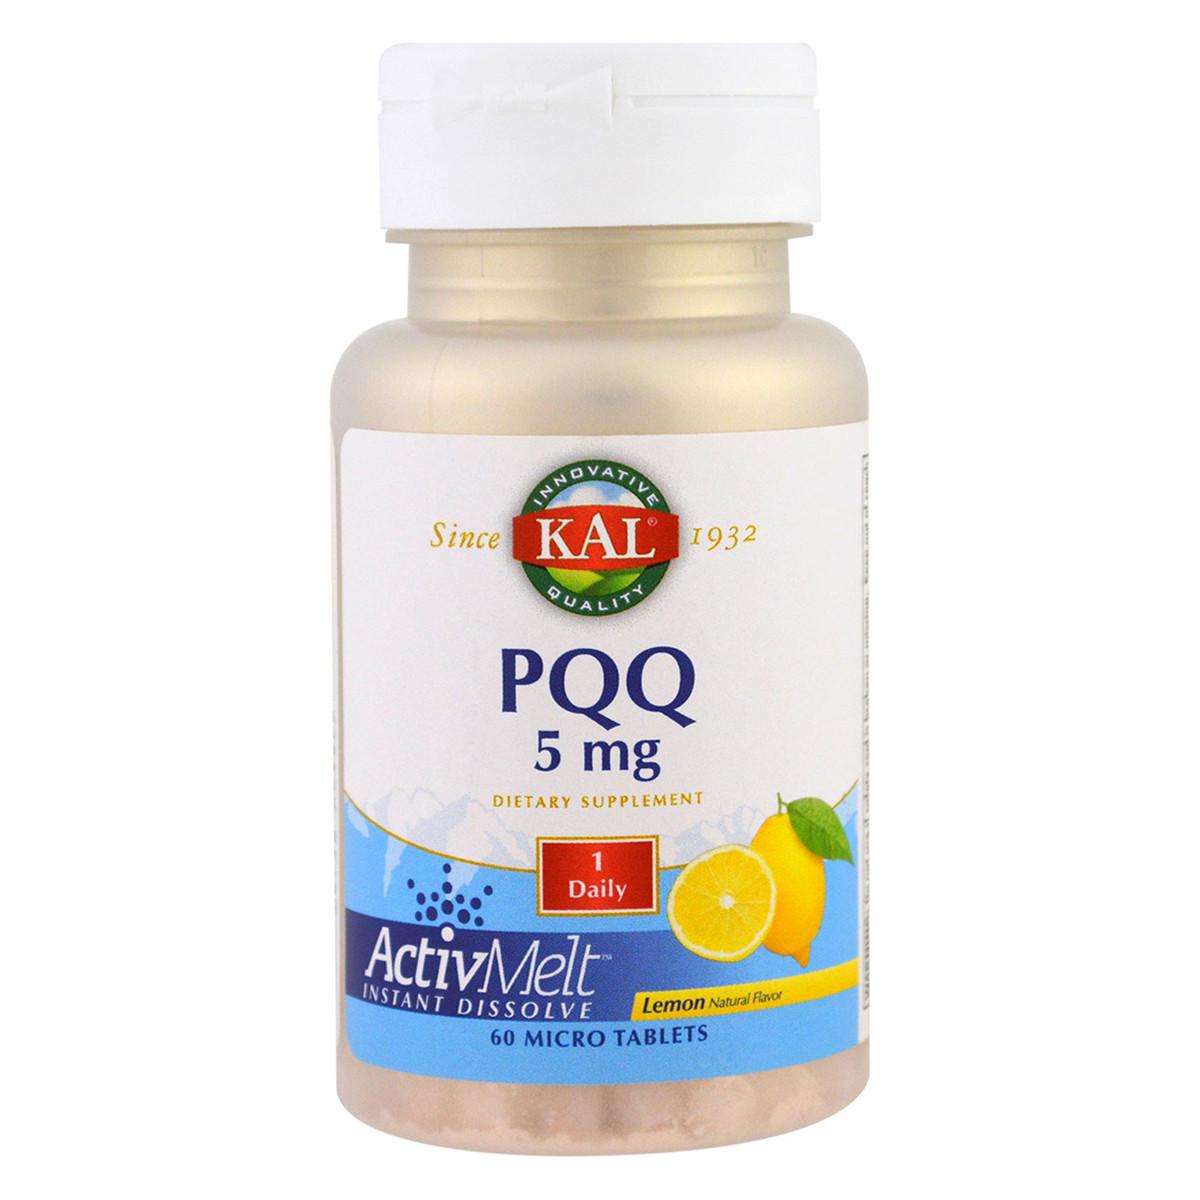 Пирролохинолинхинон PQQ, 5 мг, Вкус Лимона, KAL, 60 мини таблеток